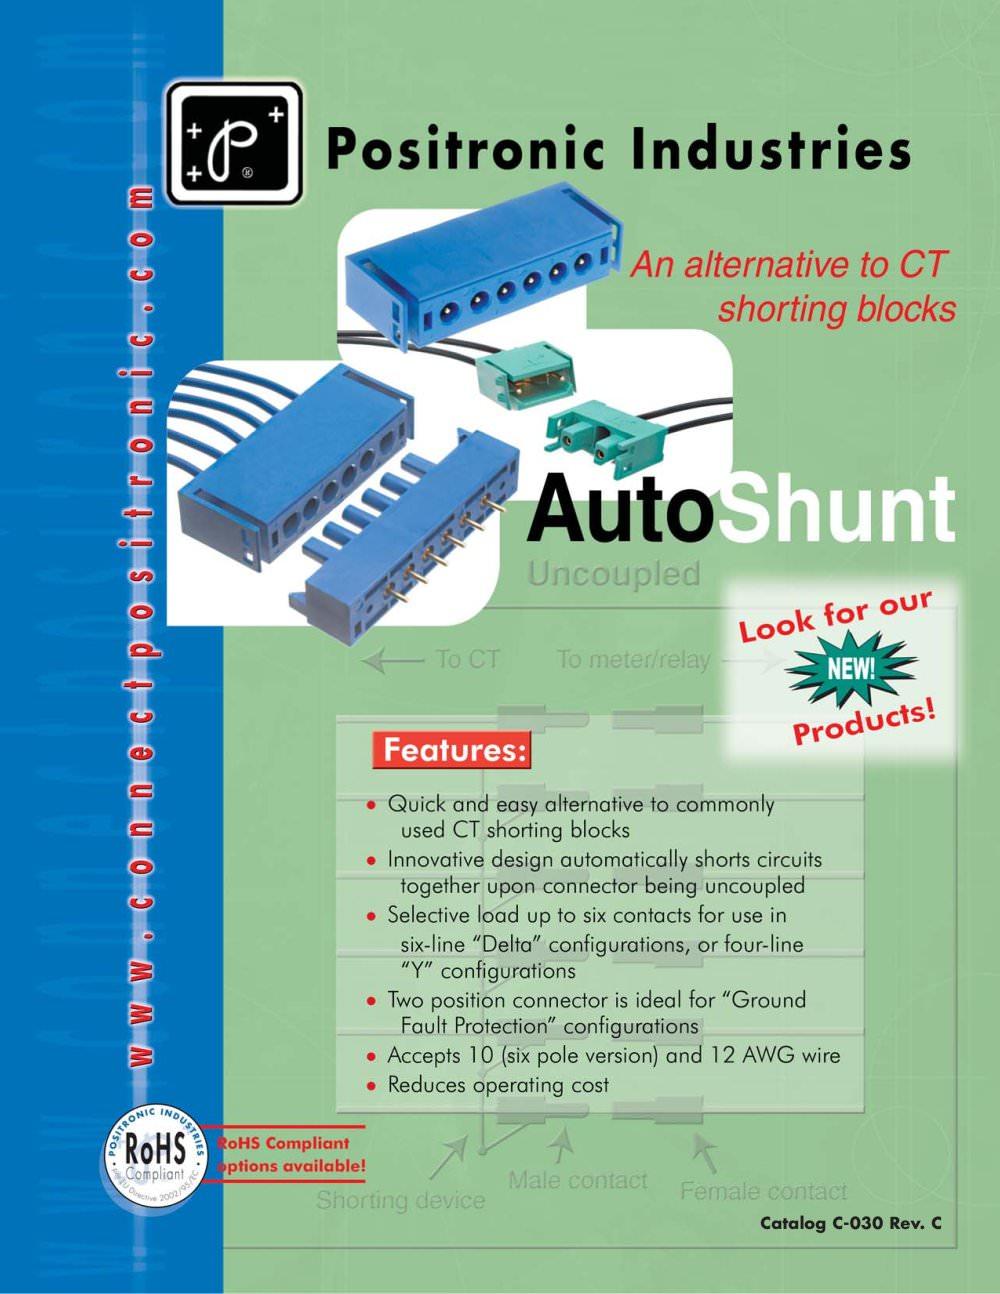 autoshunt brochure positronic industries pdf catalogue autoshunt brochure 1 13 pages